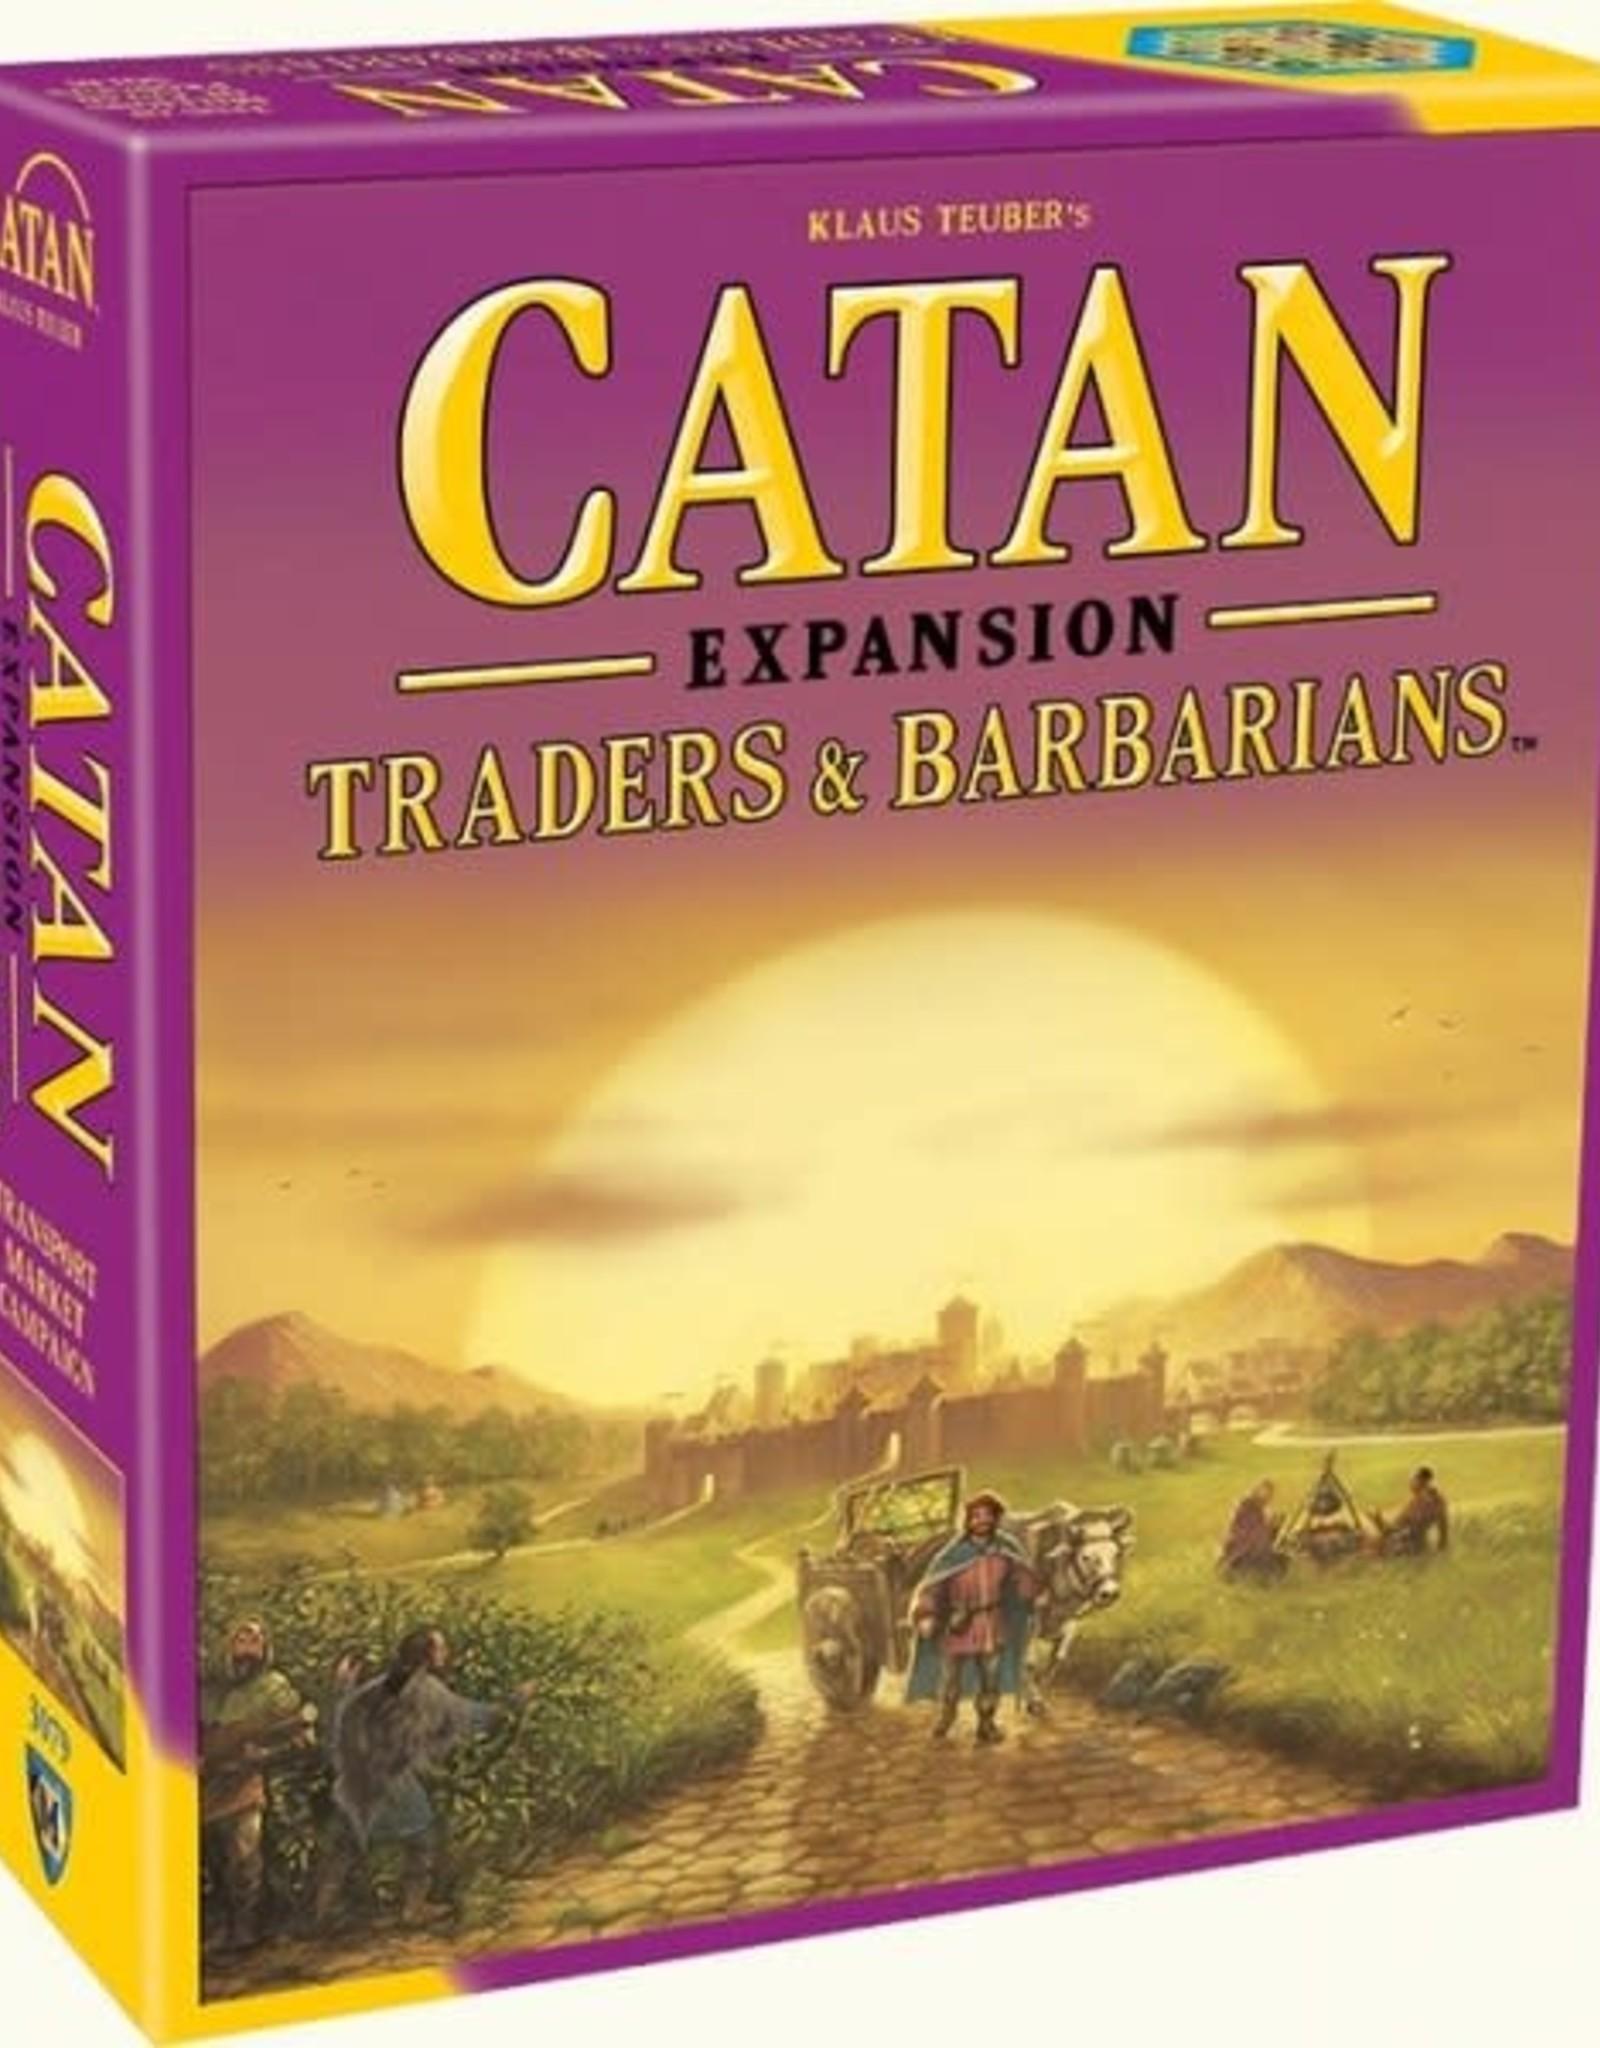 Catan Studio Catan Traders and Barbarians Expansion